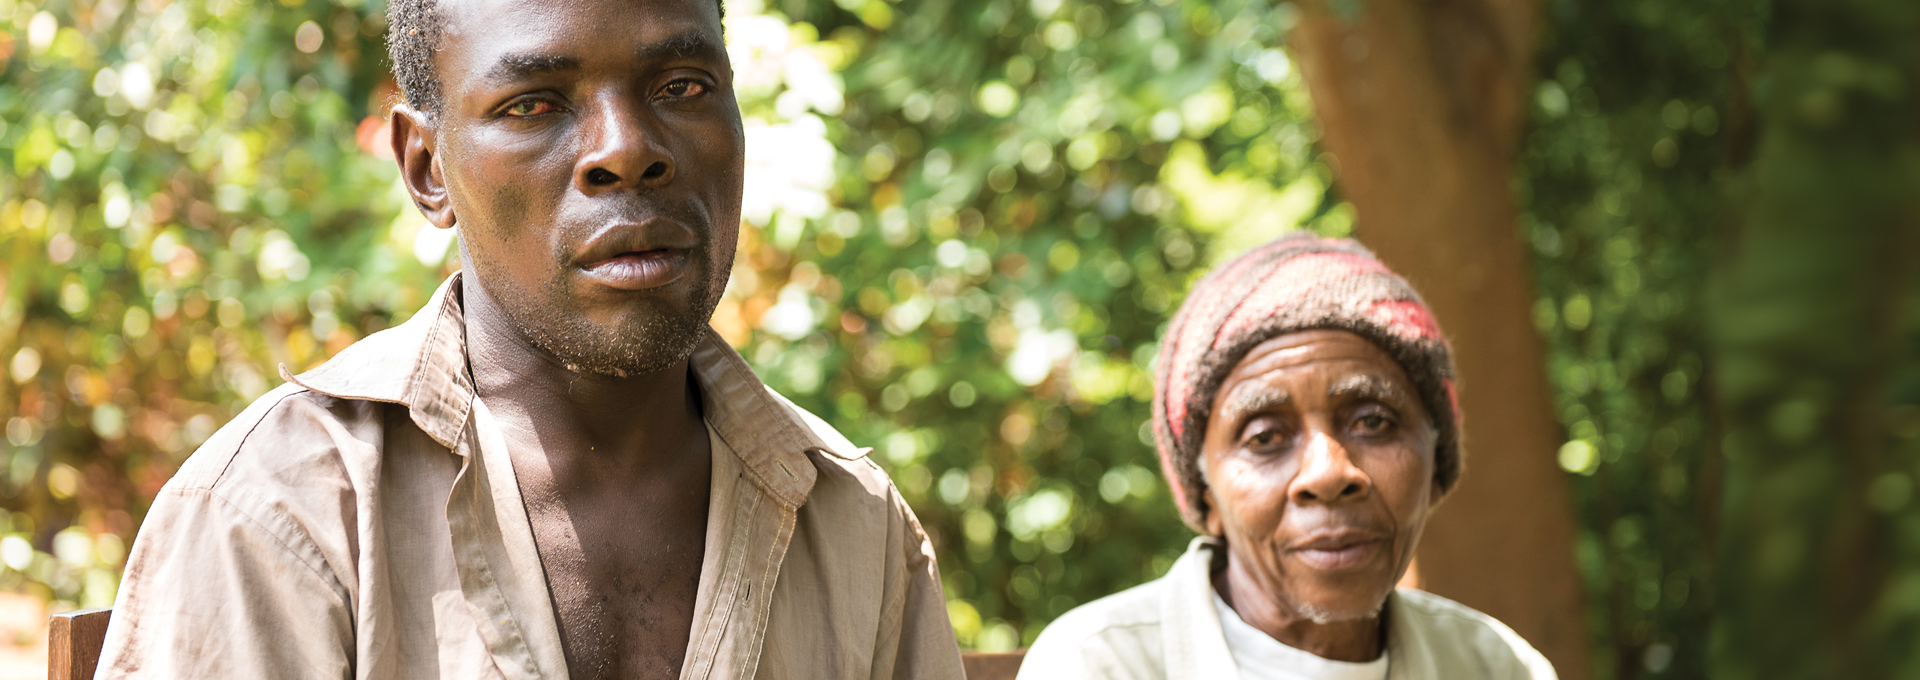 Robert and Rose mental health Malawi